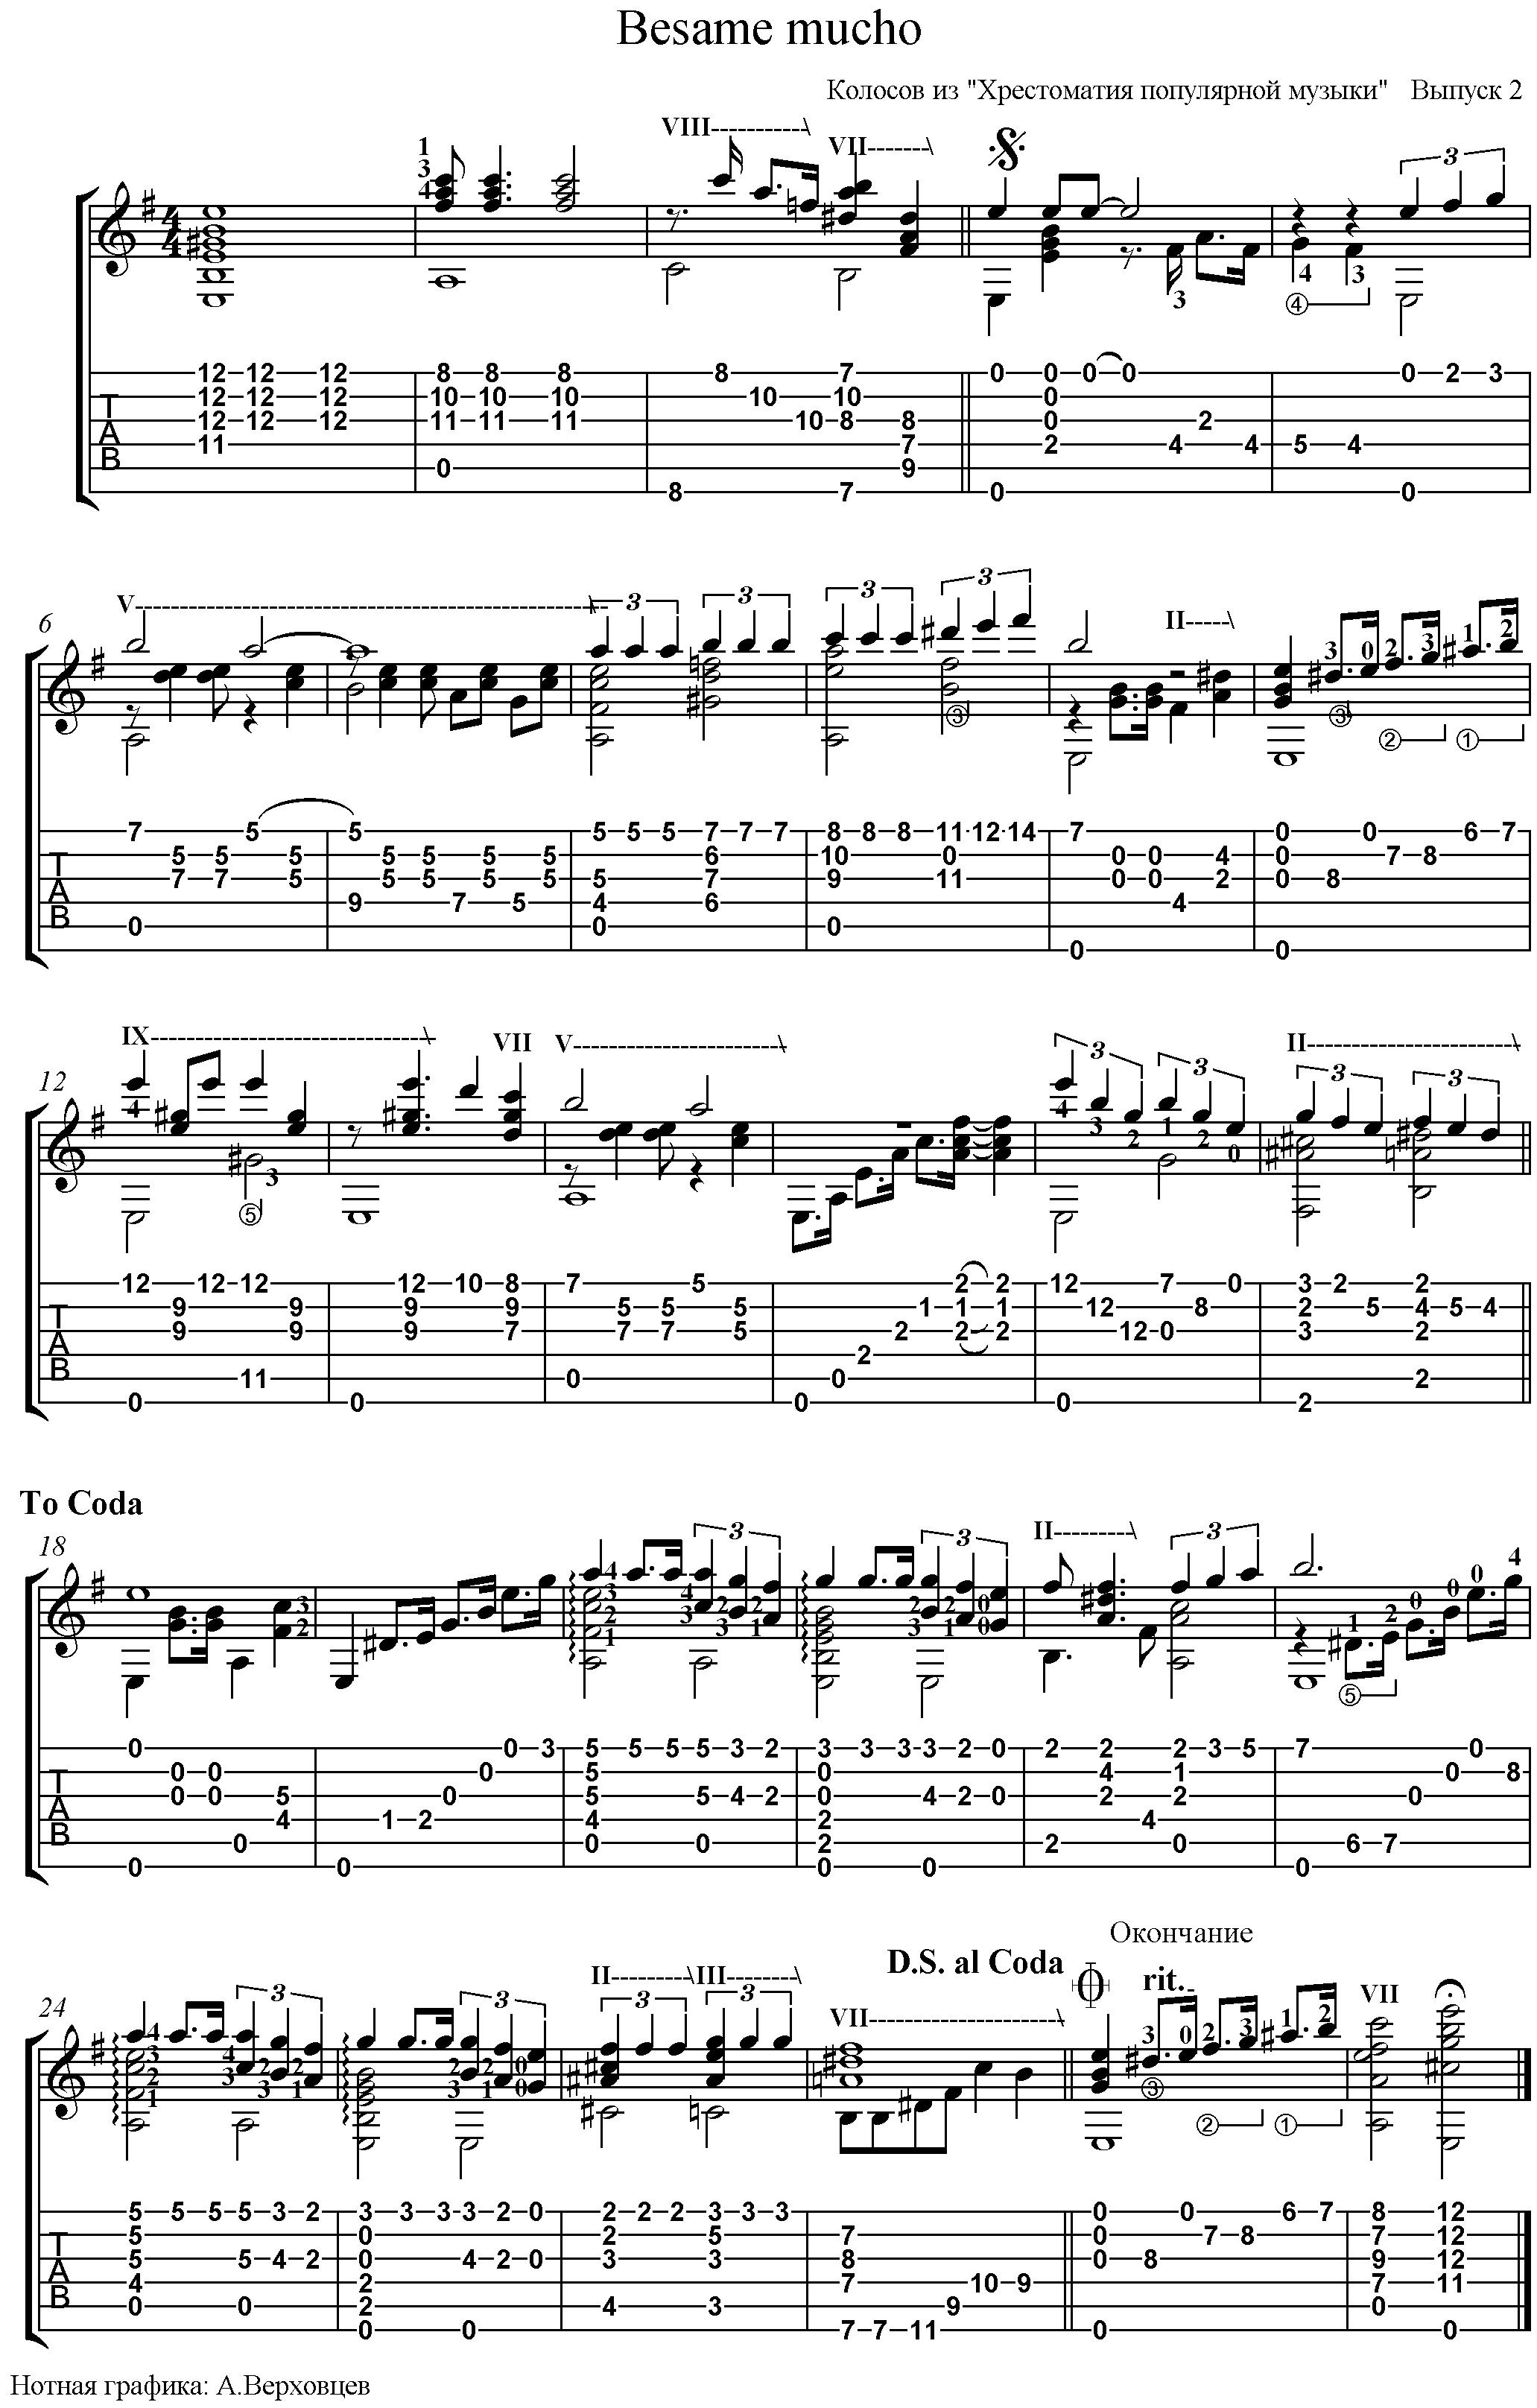 Аккорд a на гитаре. аппликатуры и описание всех вариантов аккорда